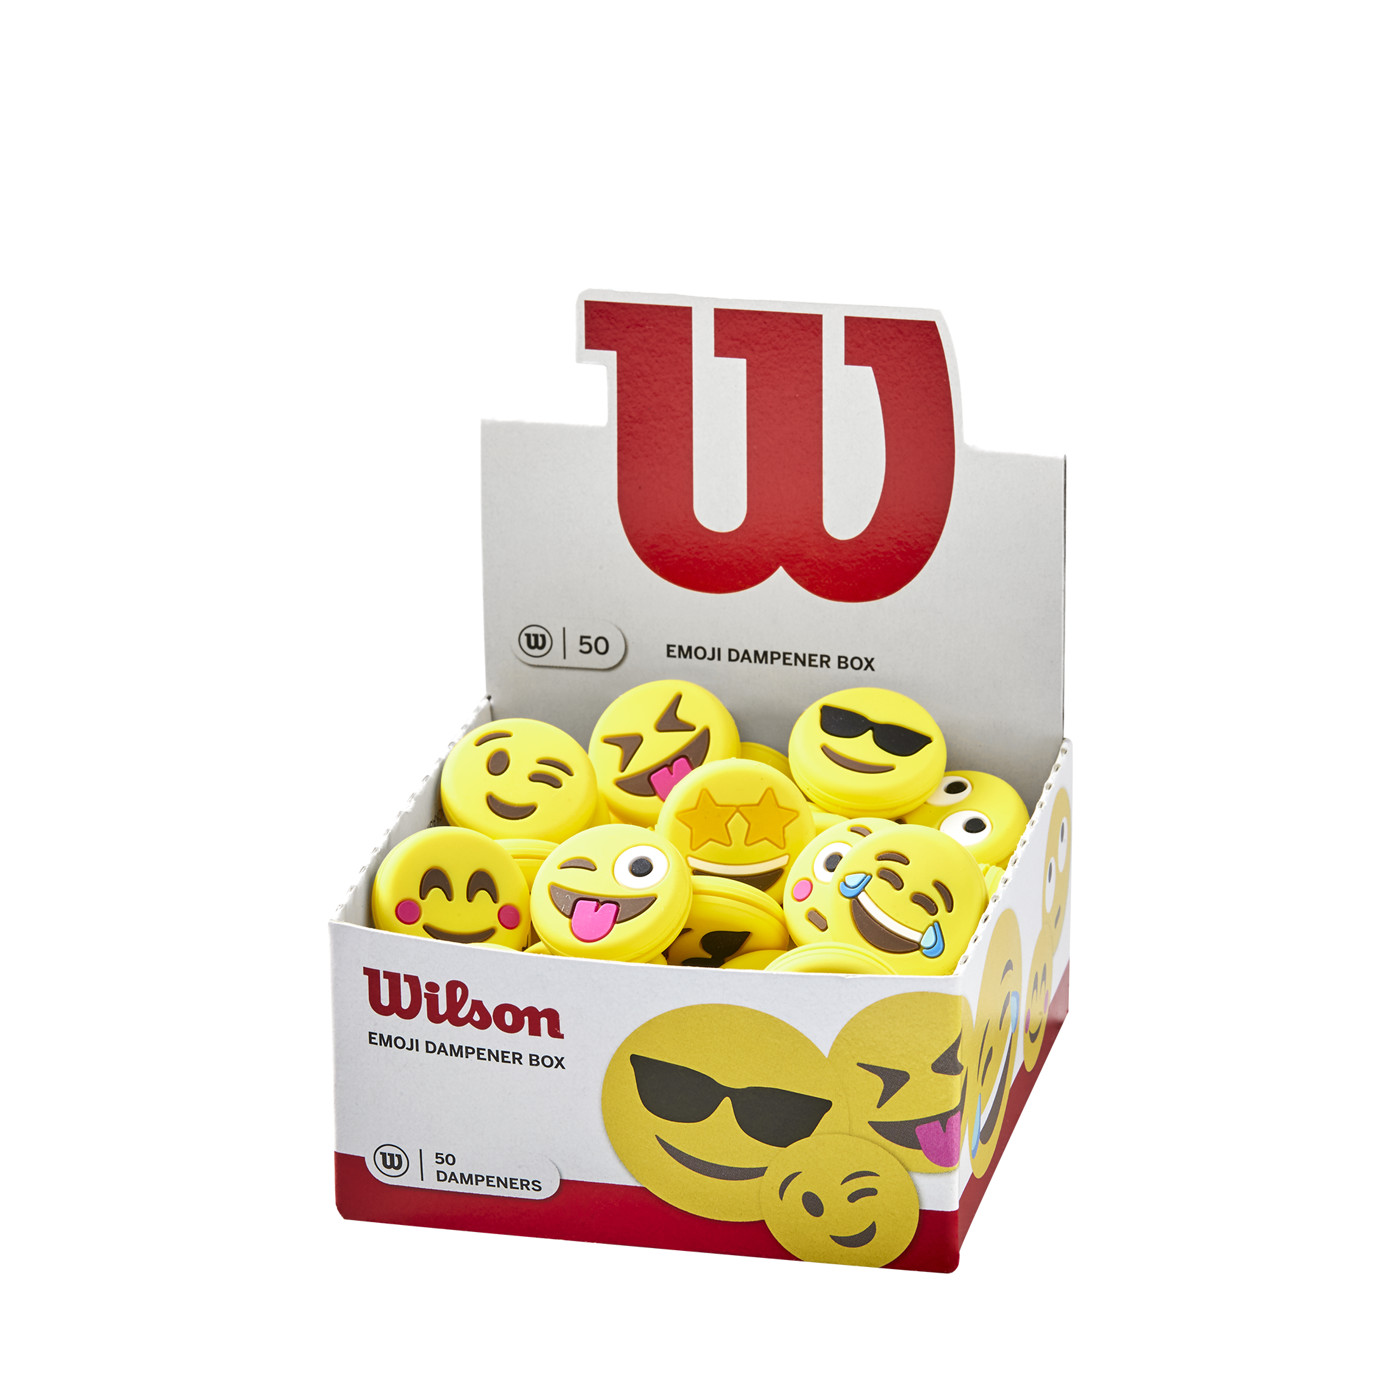 WILSON EMOJI DAMPENER BOX